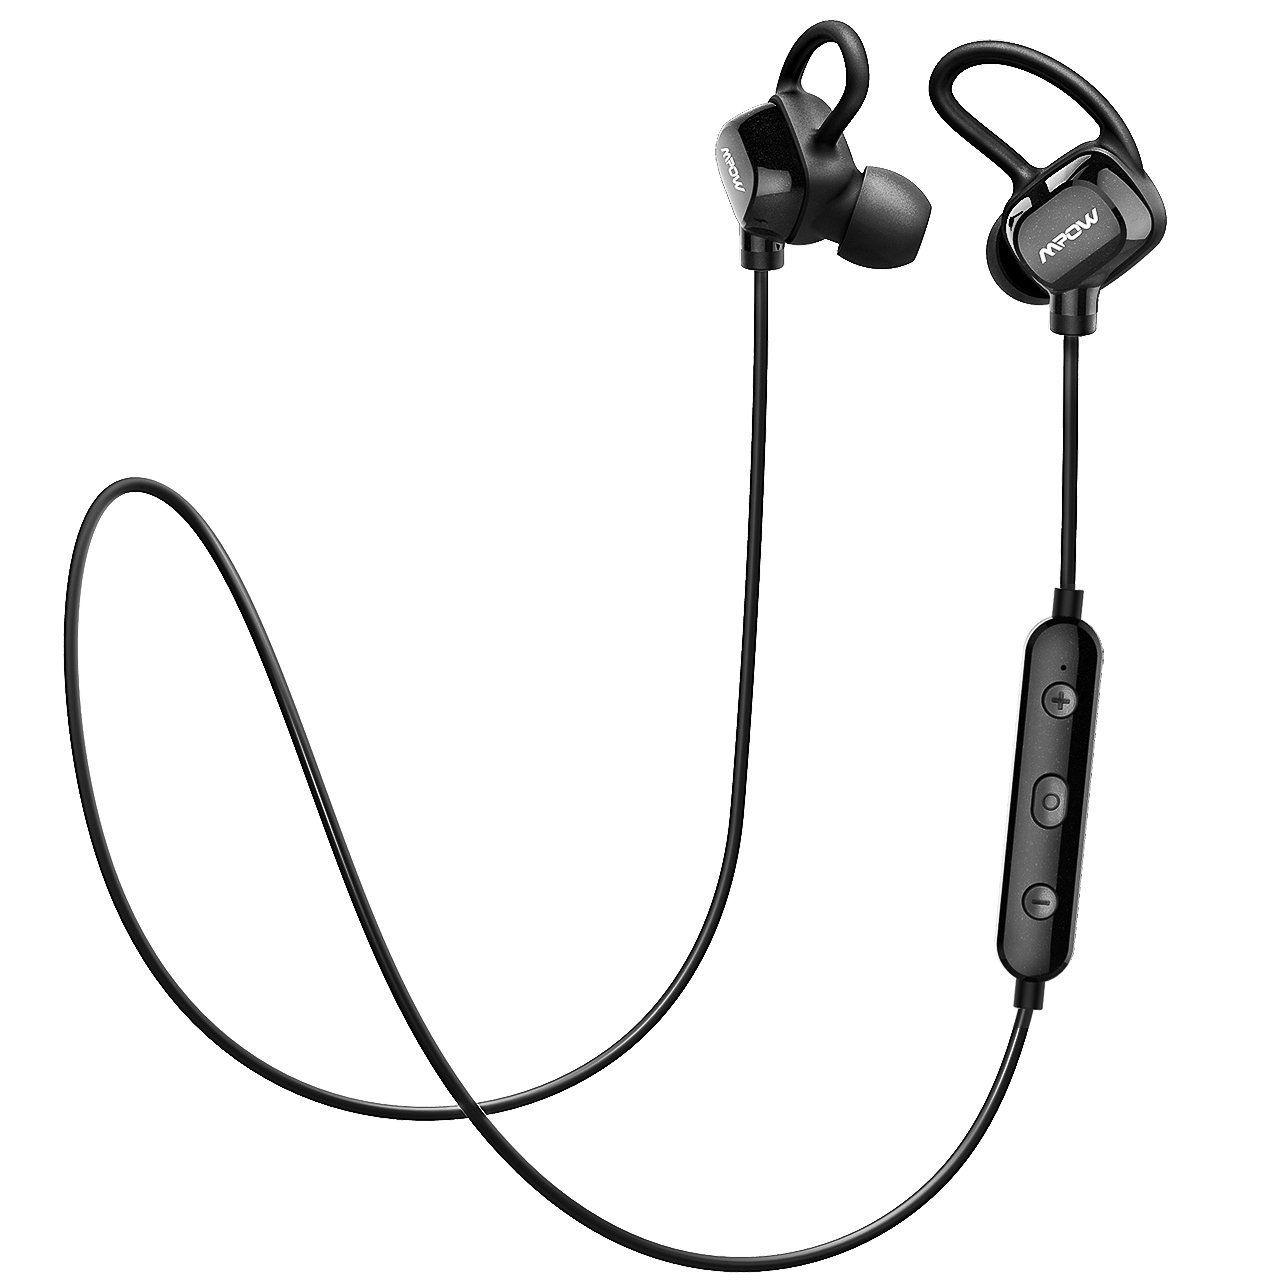 Mpow Bluetooth Headphones Wireless Earbuds